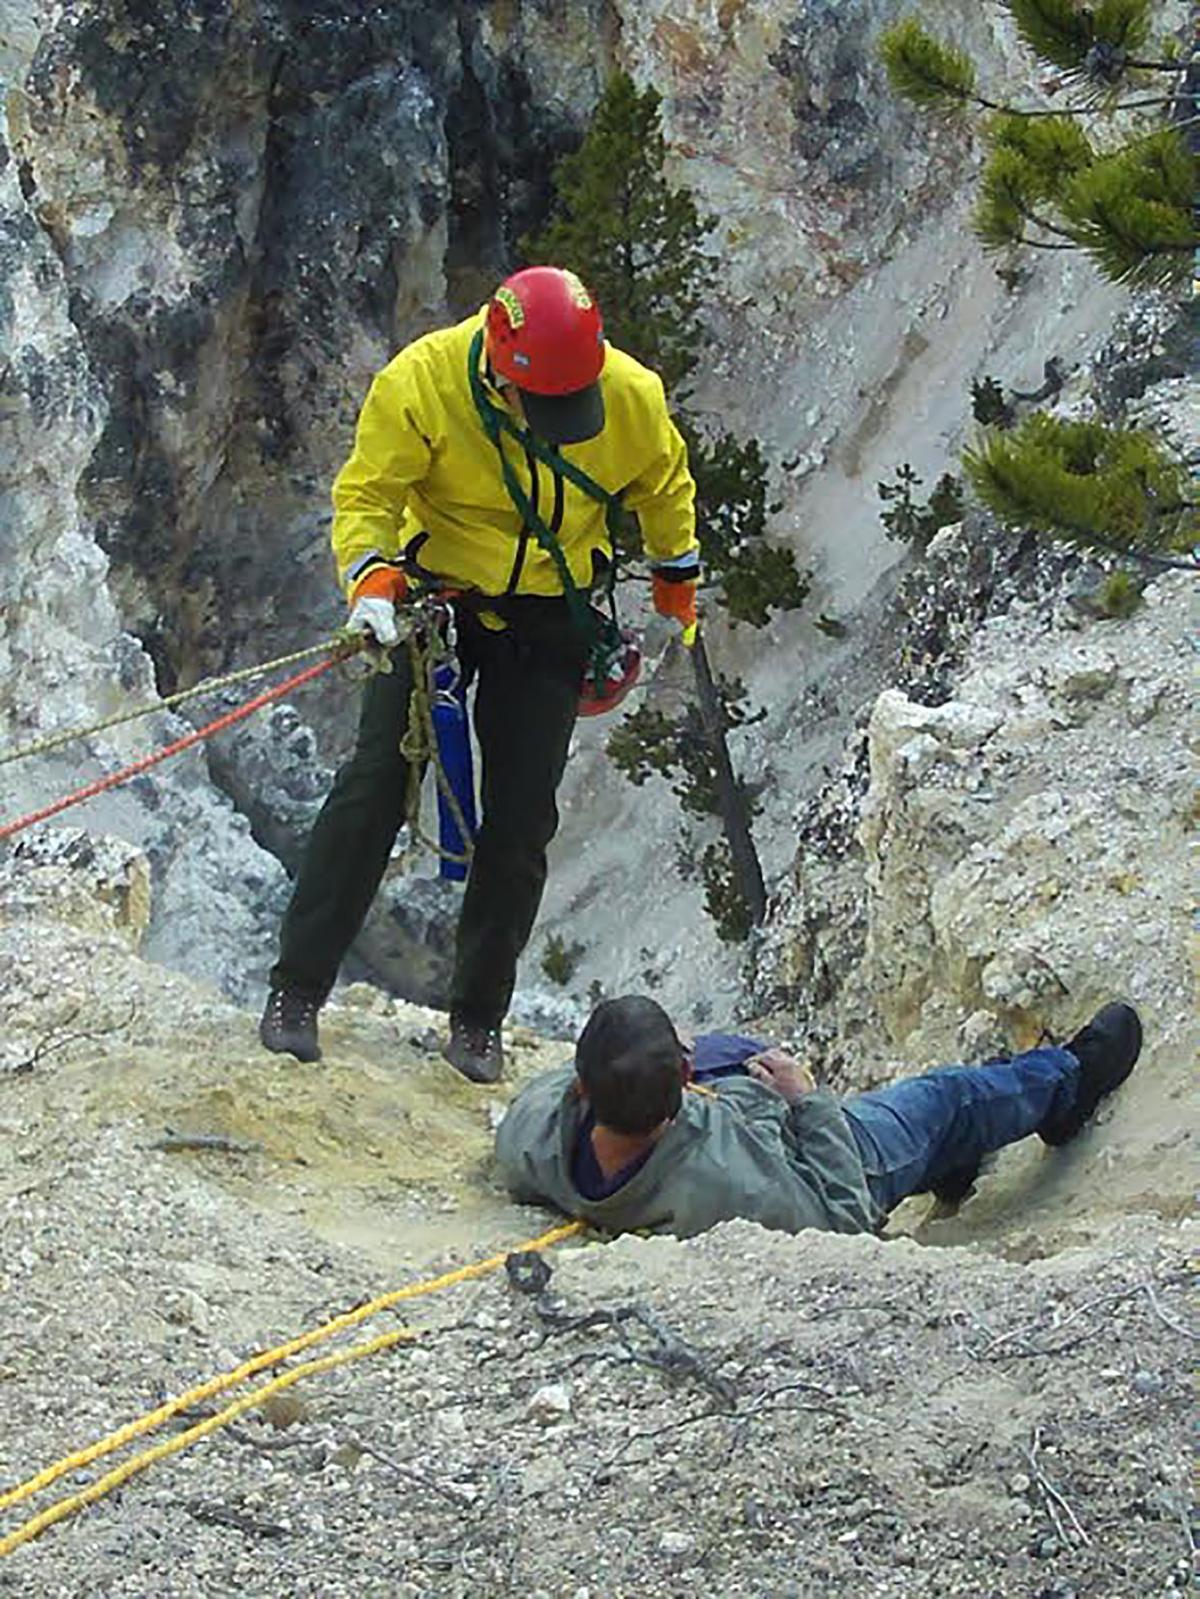 Yellowstone Park rangers save man